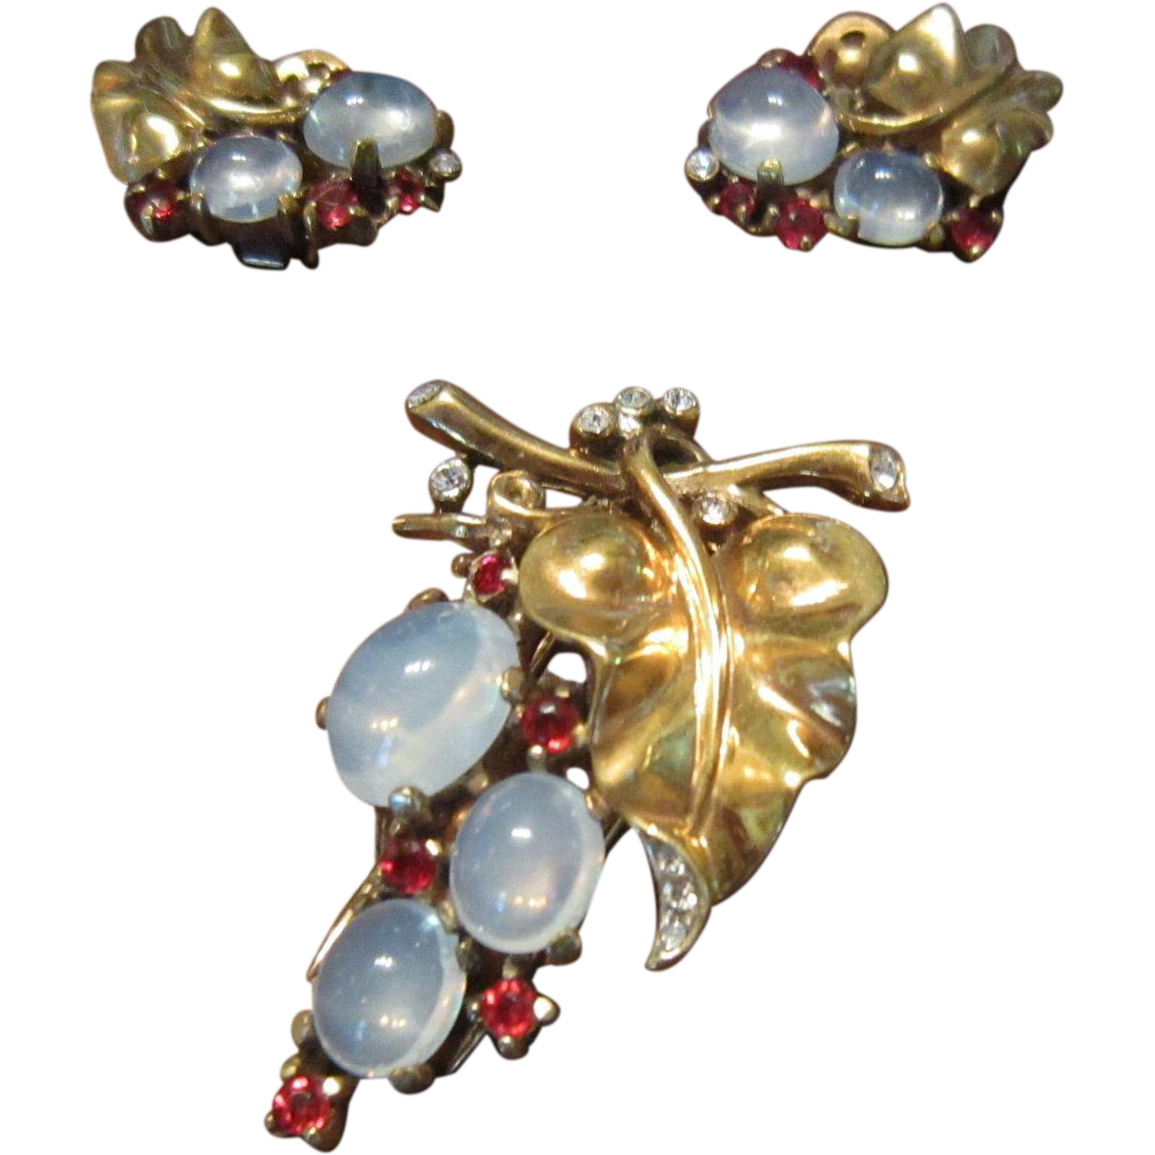 Crown Trifari Vermeil Sterling Leaf Brooch and Earrings with Faux Moonstone and Rhinestones - 1945